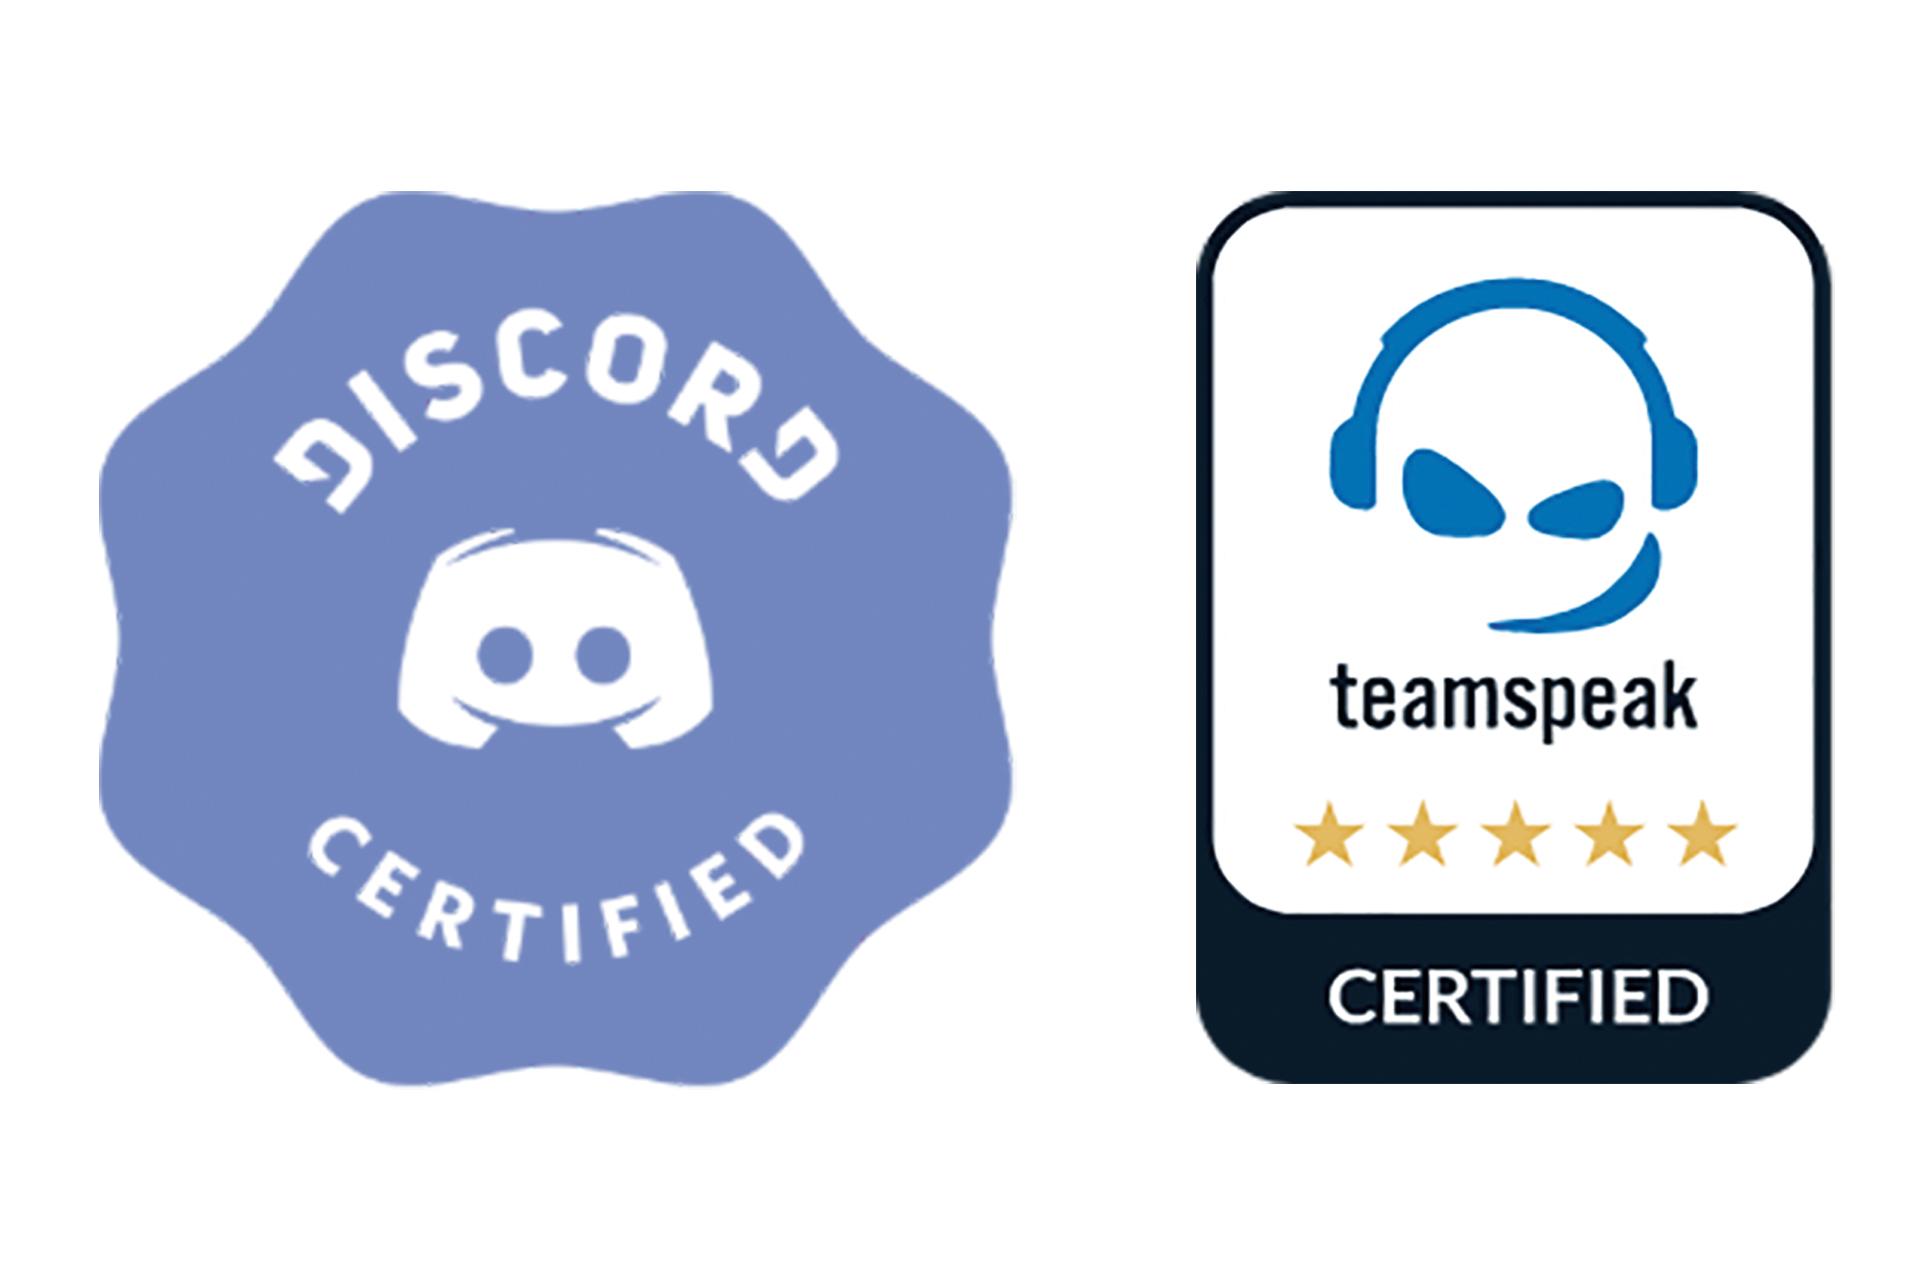 Discord Certified logo and TeamSpeak Certified logo